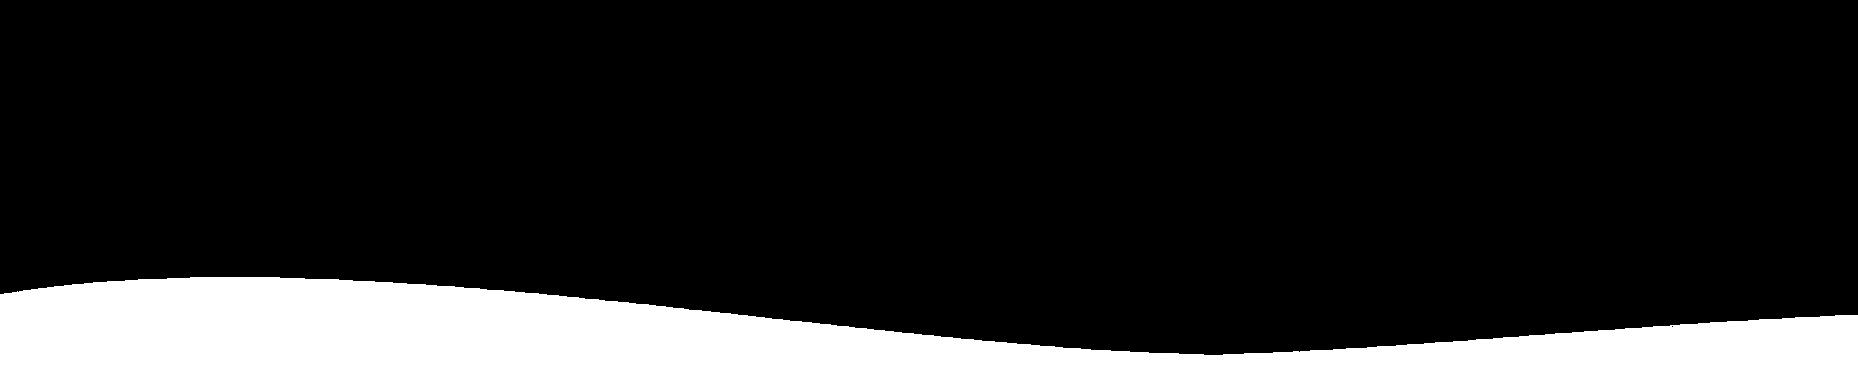 element banner.png